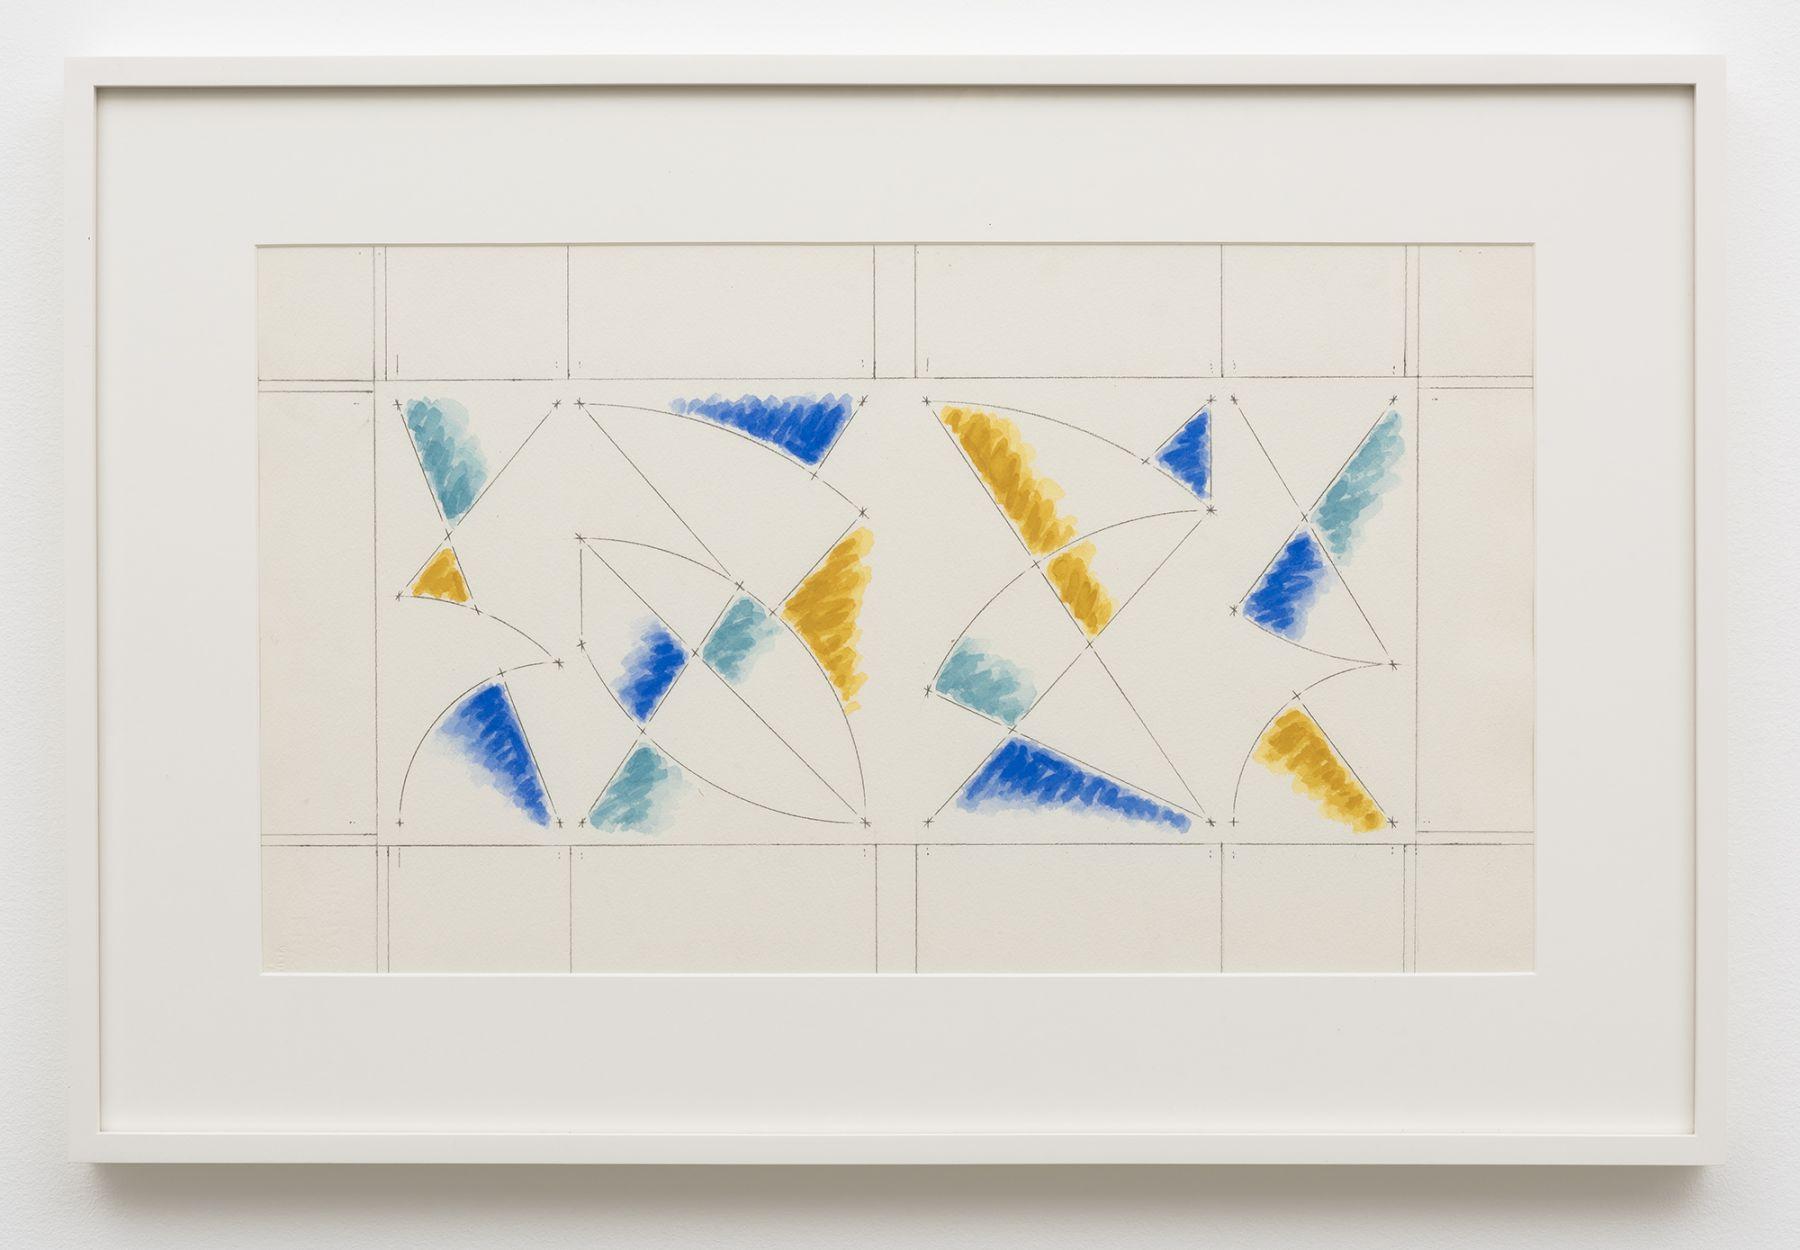 Jiro Takamatsu, Space in Two Dimensions, No.1300